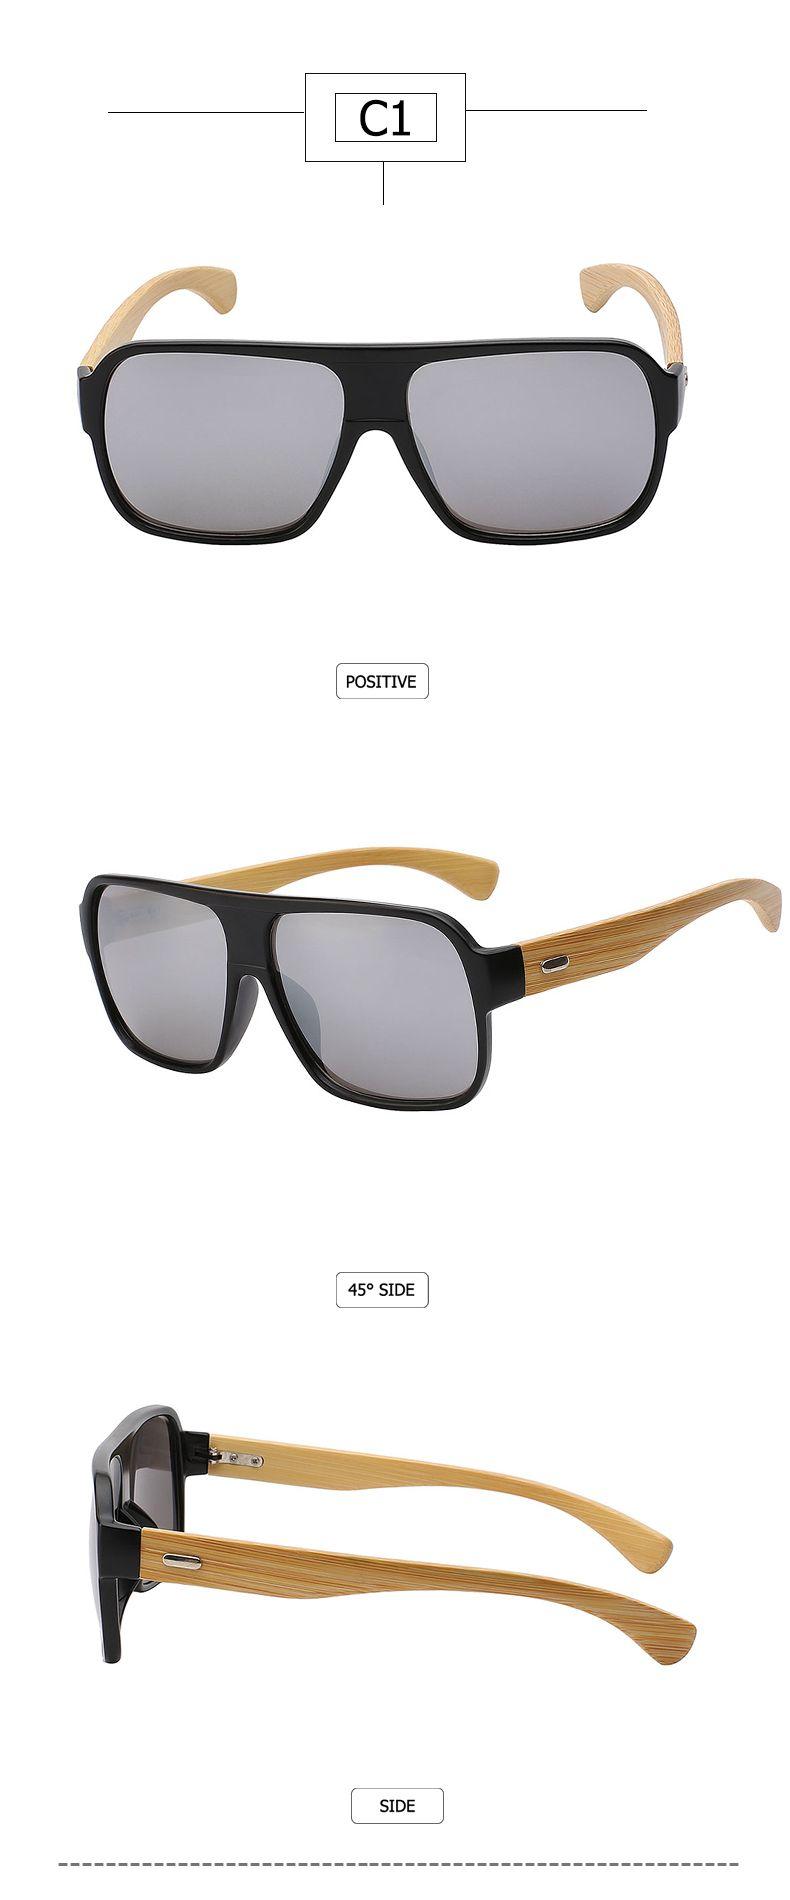 fec4d853fc Max glasiz New 2016 Bamboo Frame Square Wooden Sunglasses Men Retro Vintage  Eyewear Unisex Male Glasses Oculos De Sol Madeira 7